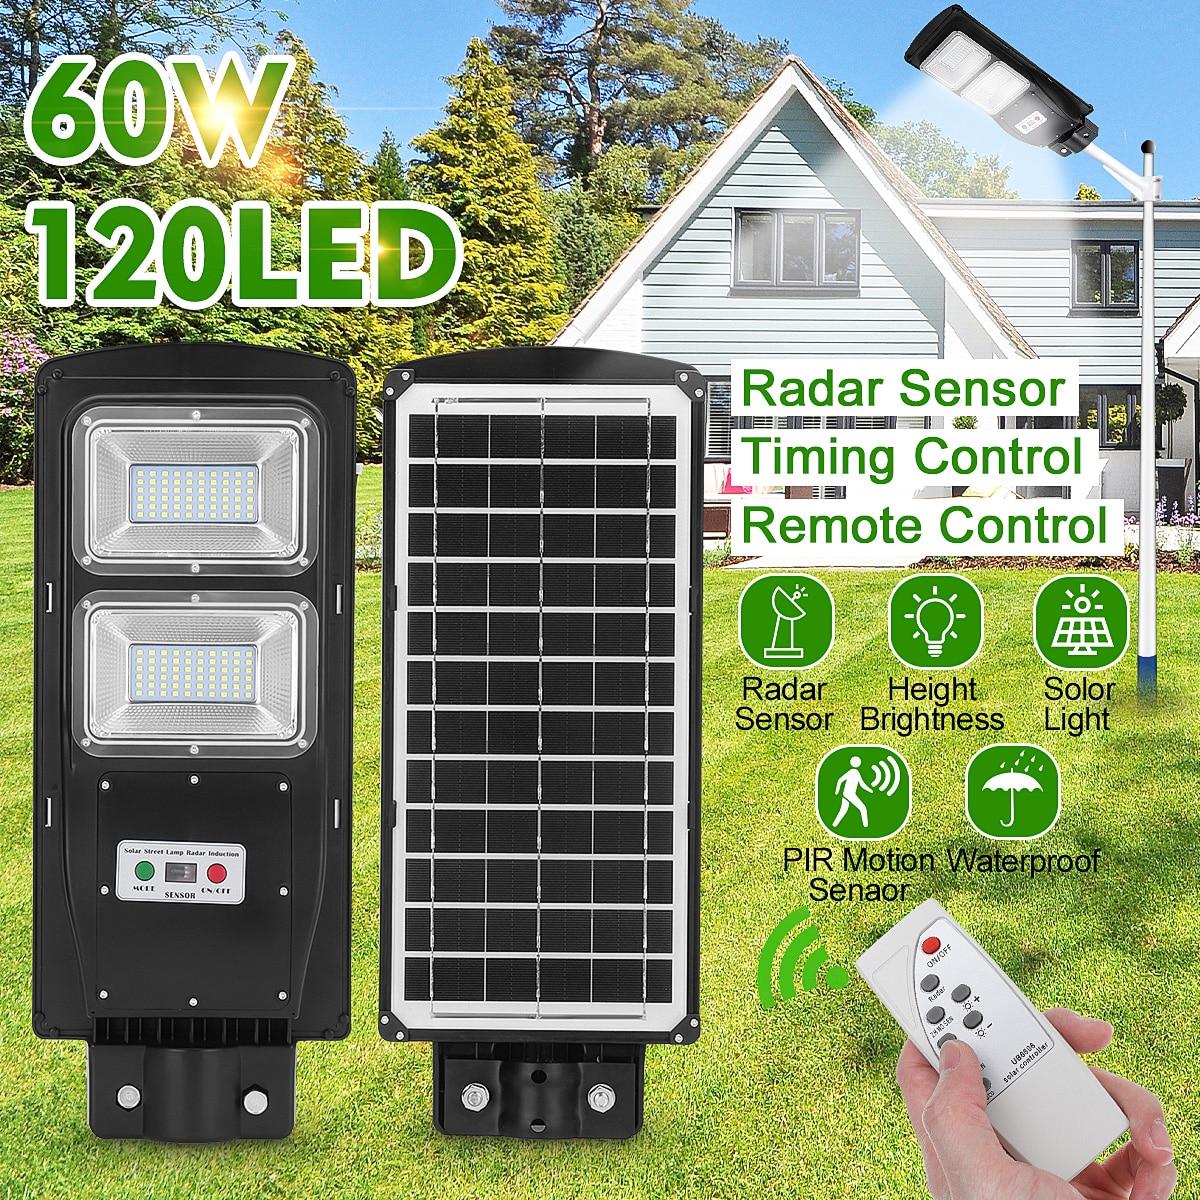 Remote Control LED Street Light 60W LED Solar Light Radar PIR Motion Sensor Wall Timing Lamp Waterproof for Plaza Garden Yard